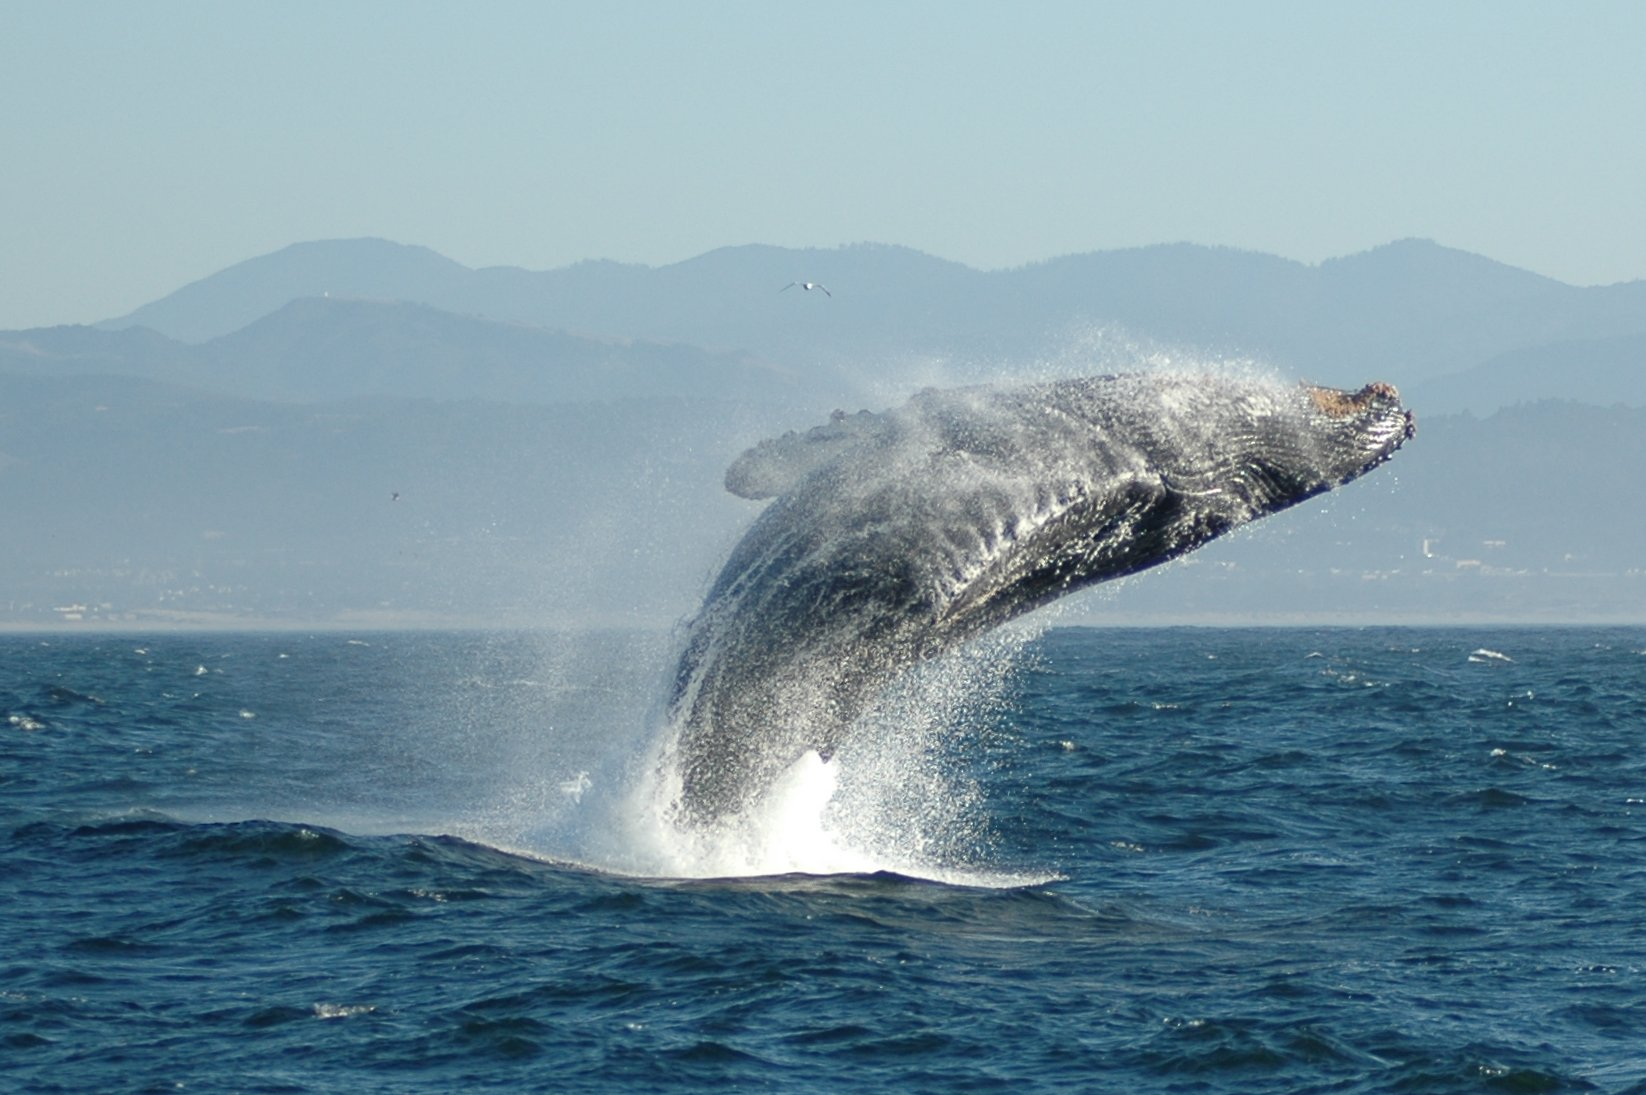 File:Jumping Humpback whale.jpg - Wikipedia